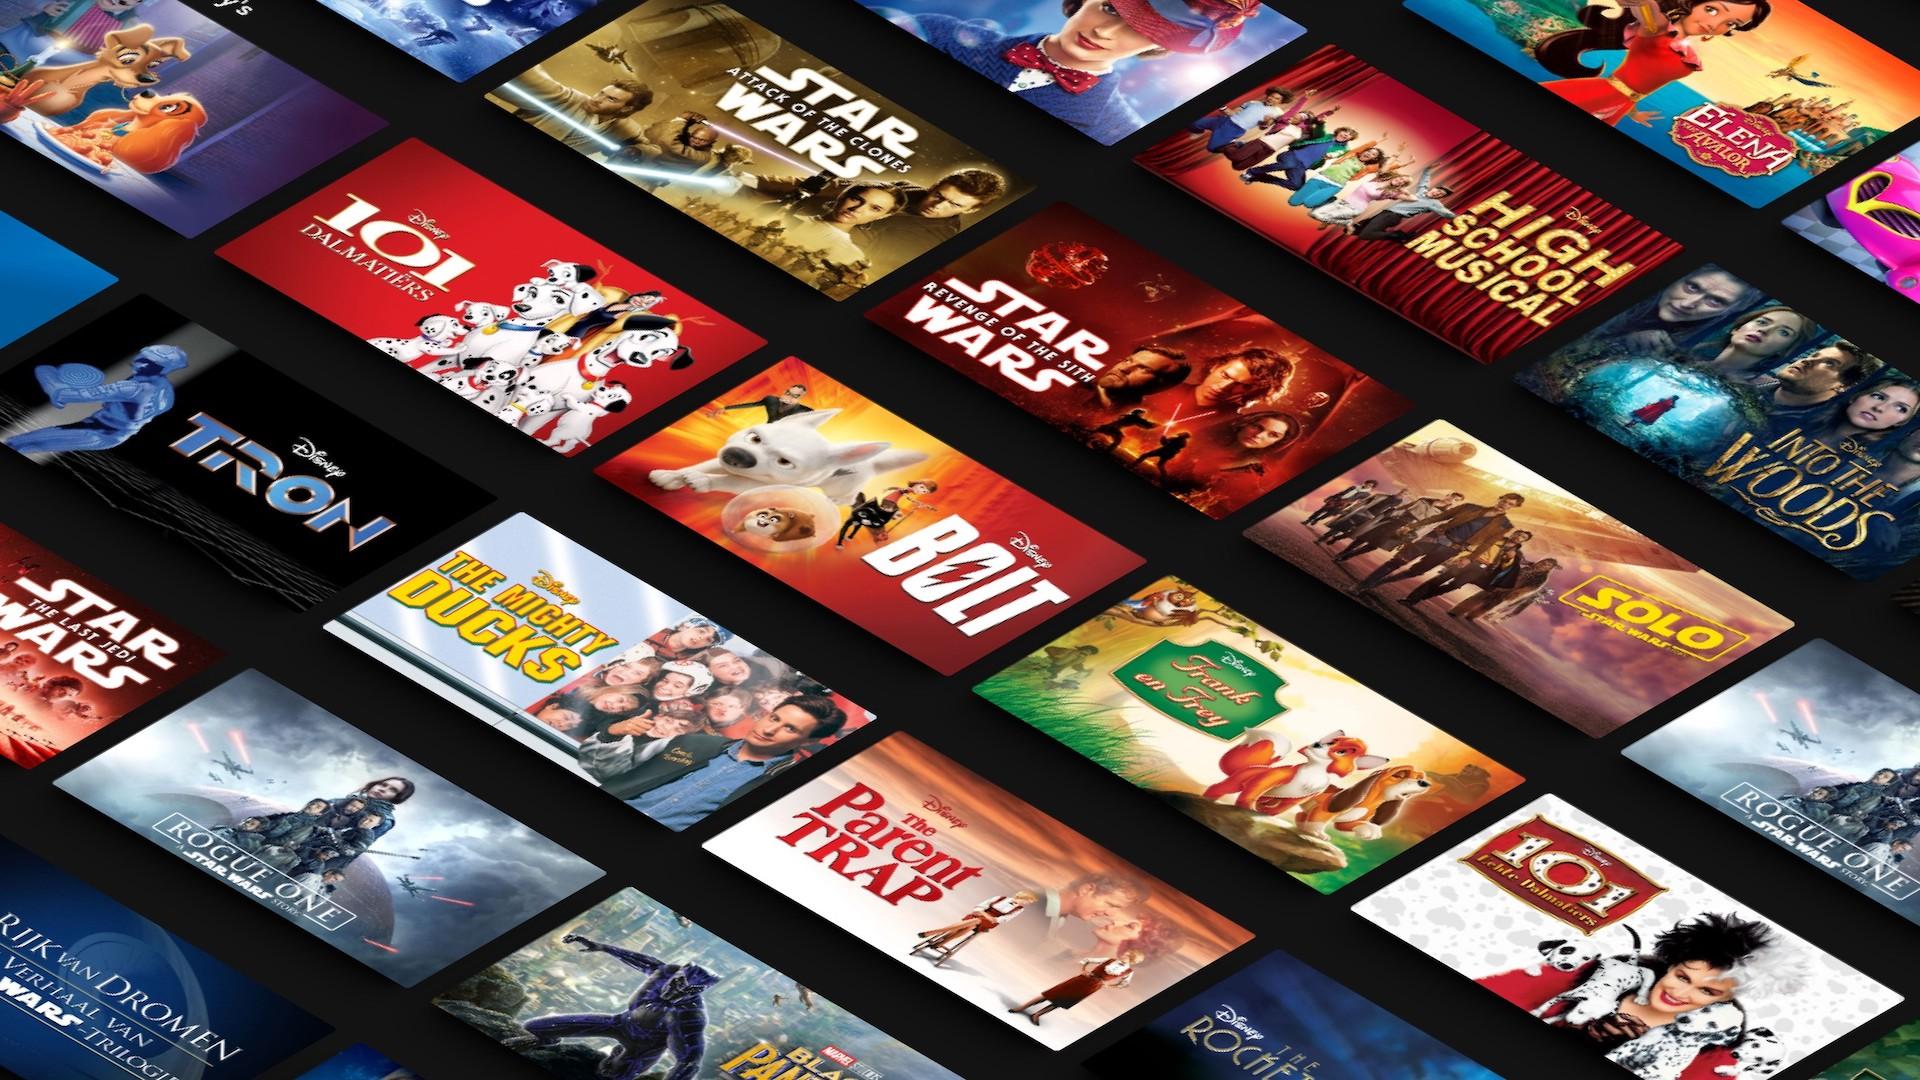 Disney Plus vs. Netflix vs. Prime Video vs. Apple TV: ¿cuál es mejor?